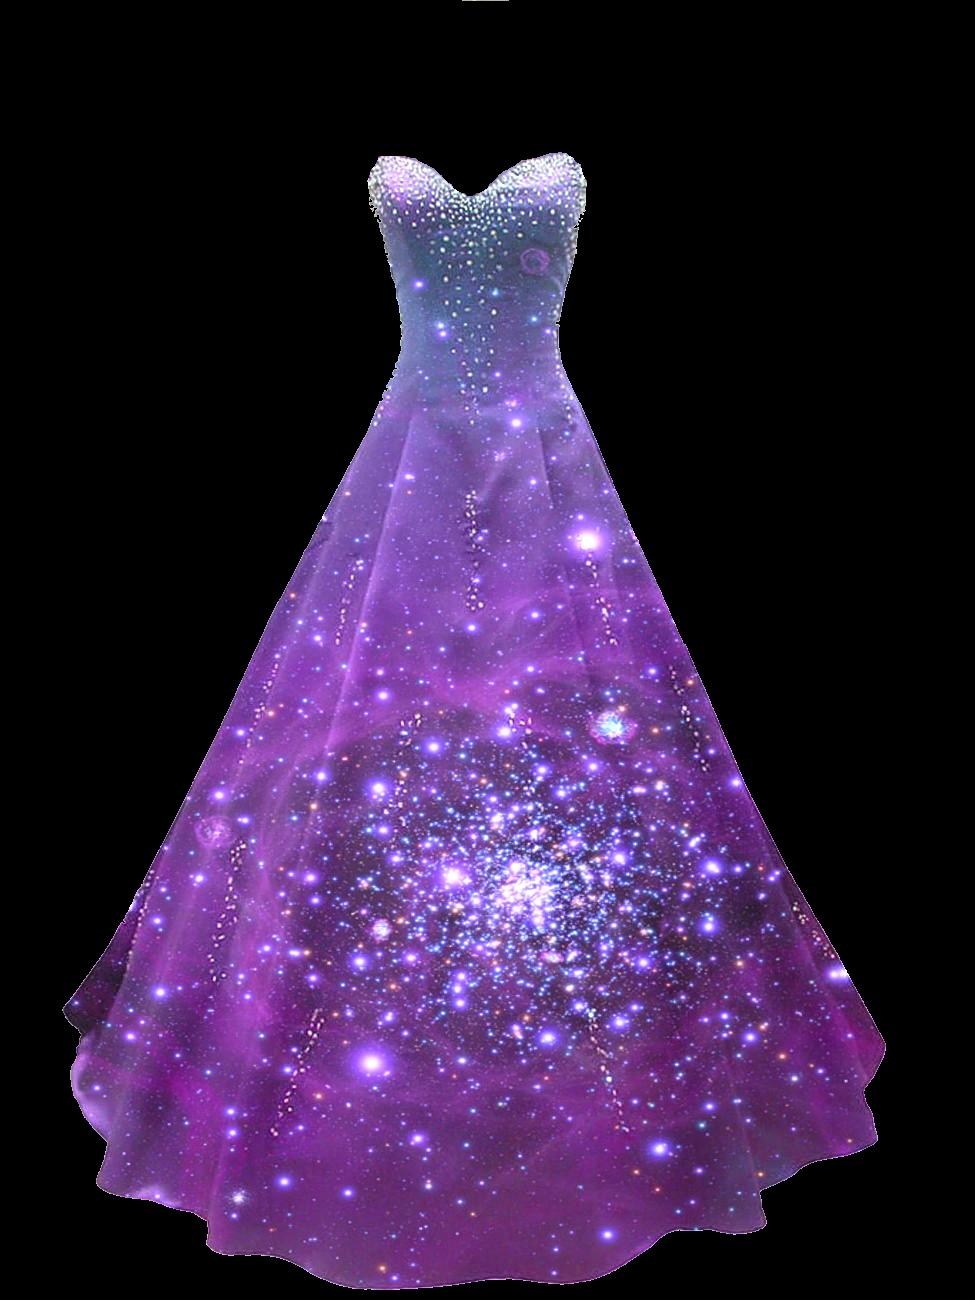 Elegant dress png #26090.